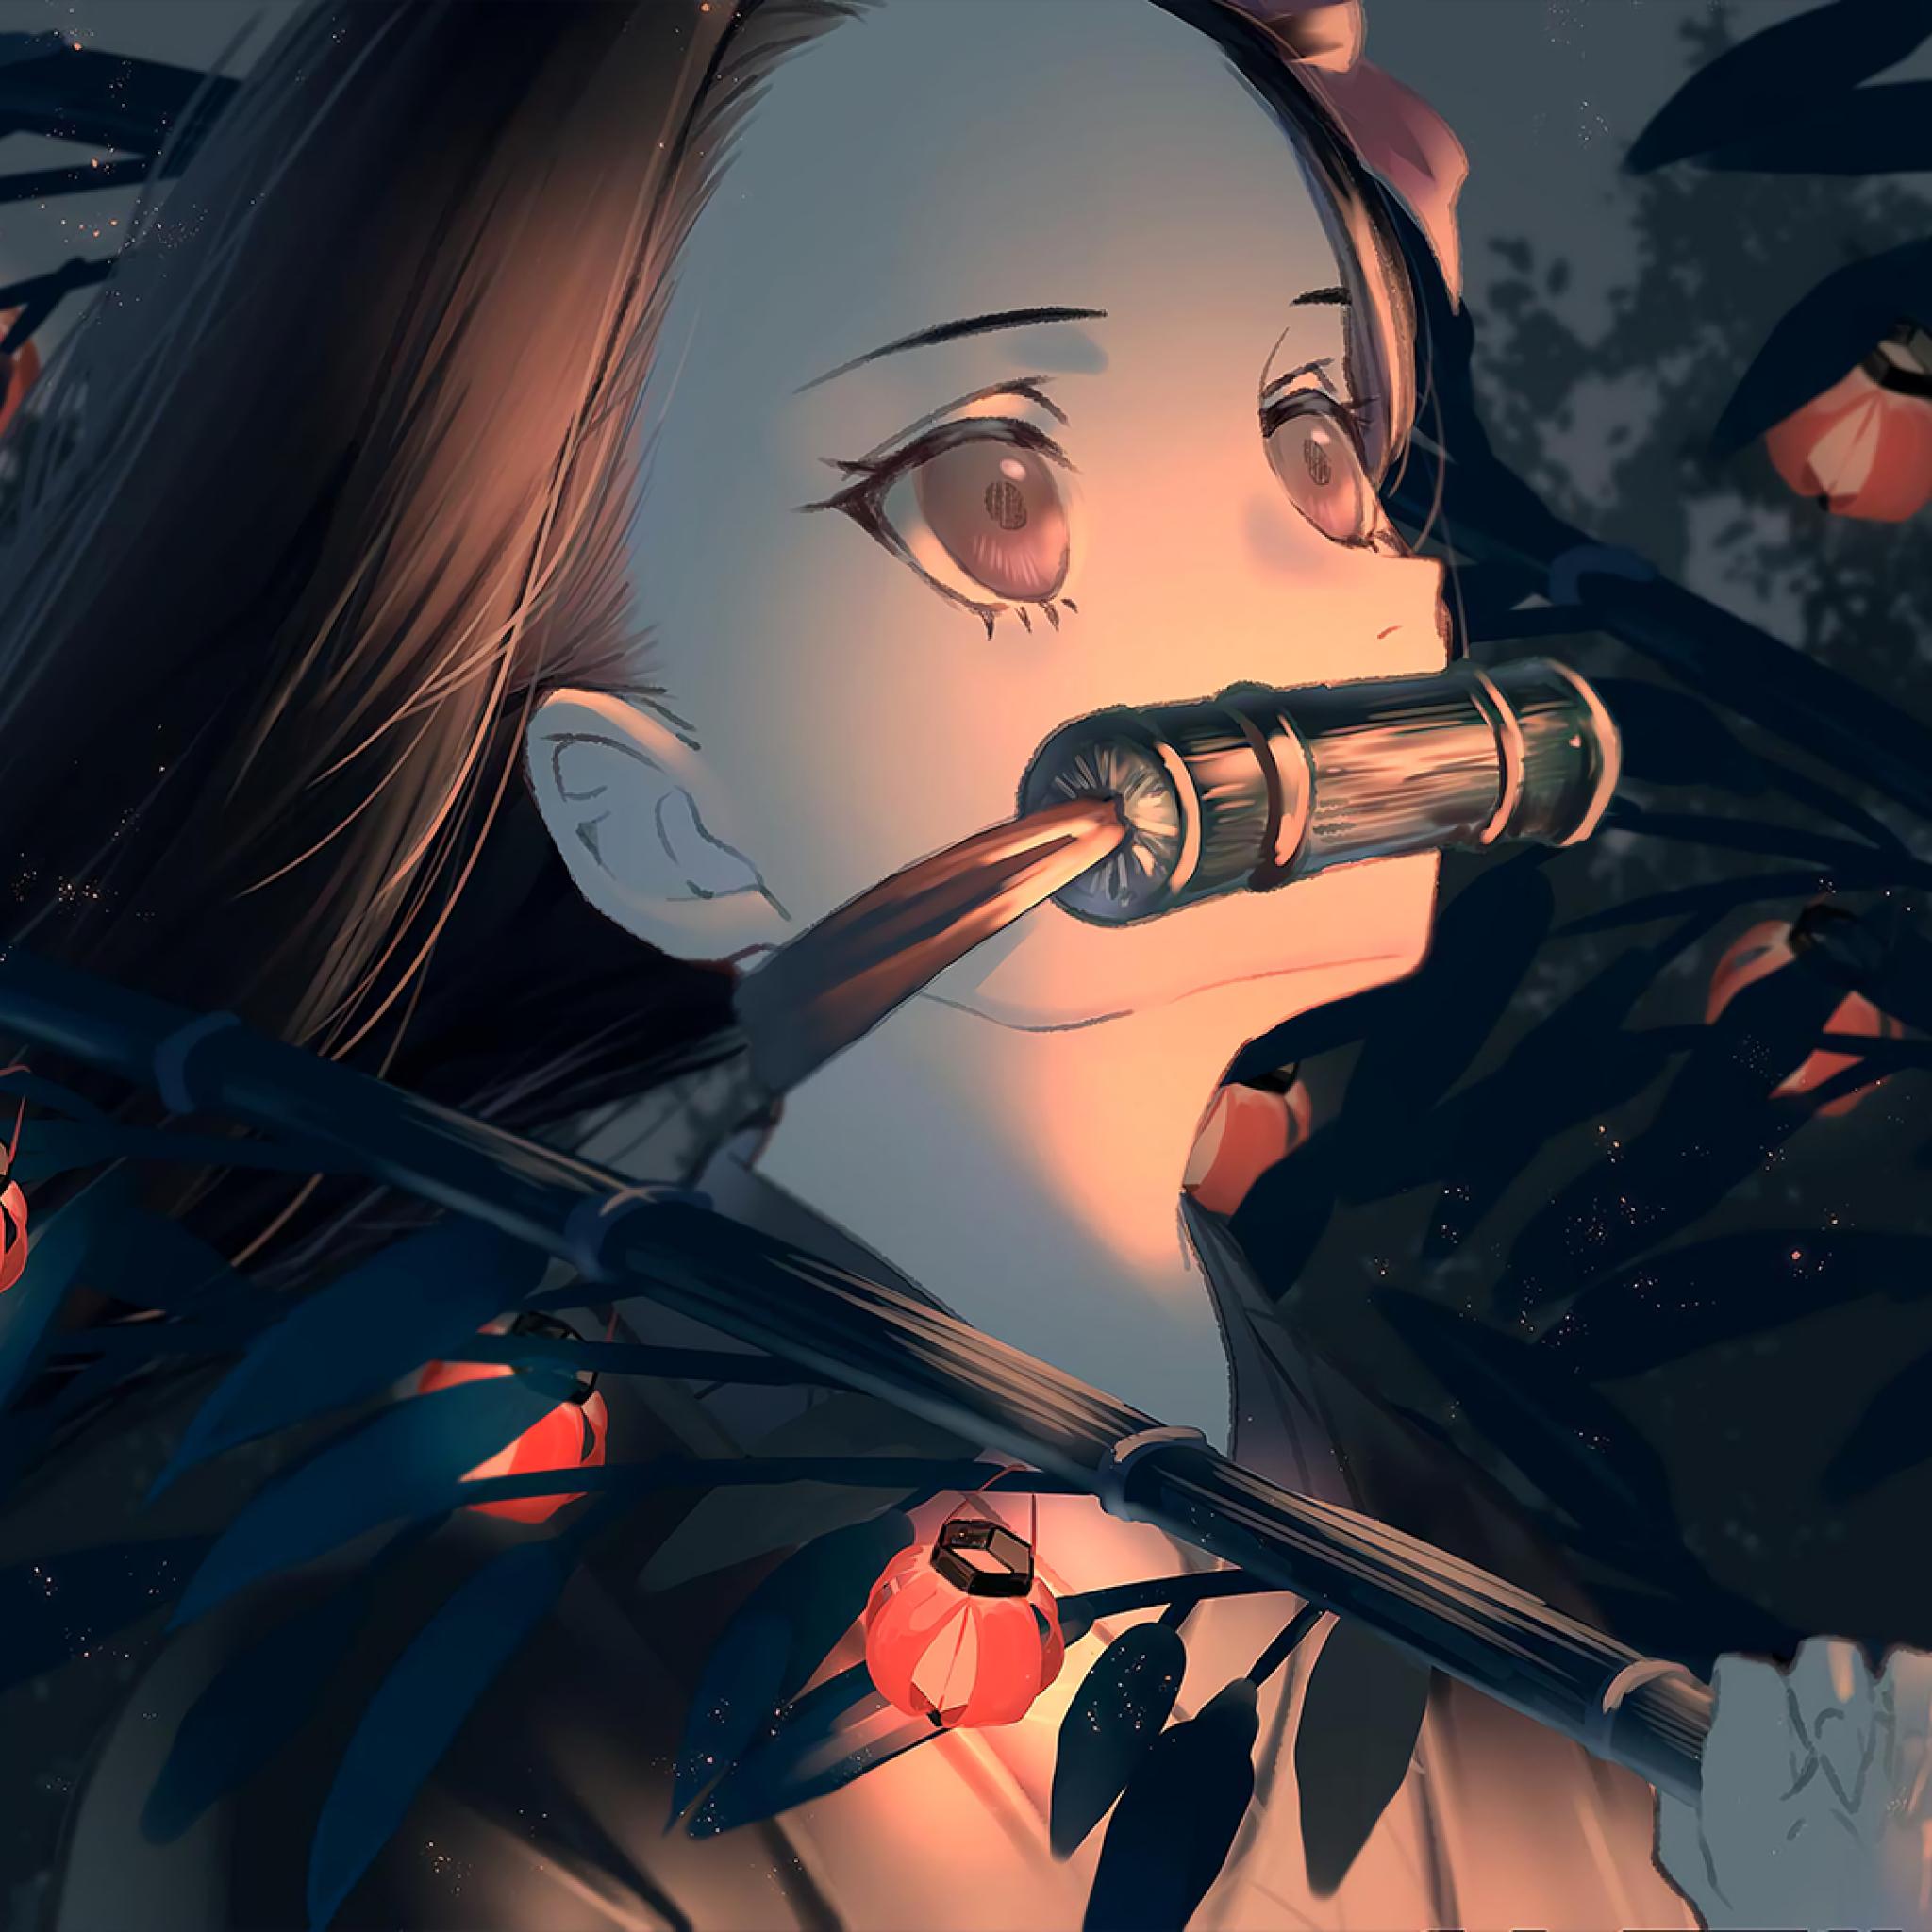 2048x2048 Nezuko Kamado Artwork Ipad Air Wallpaper, HD ...